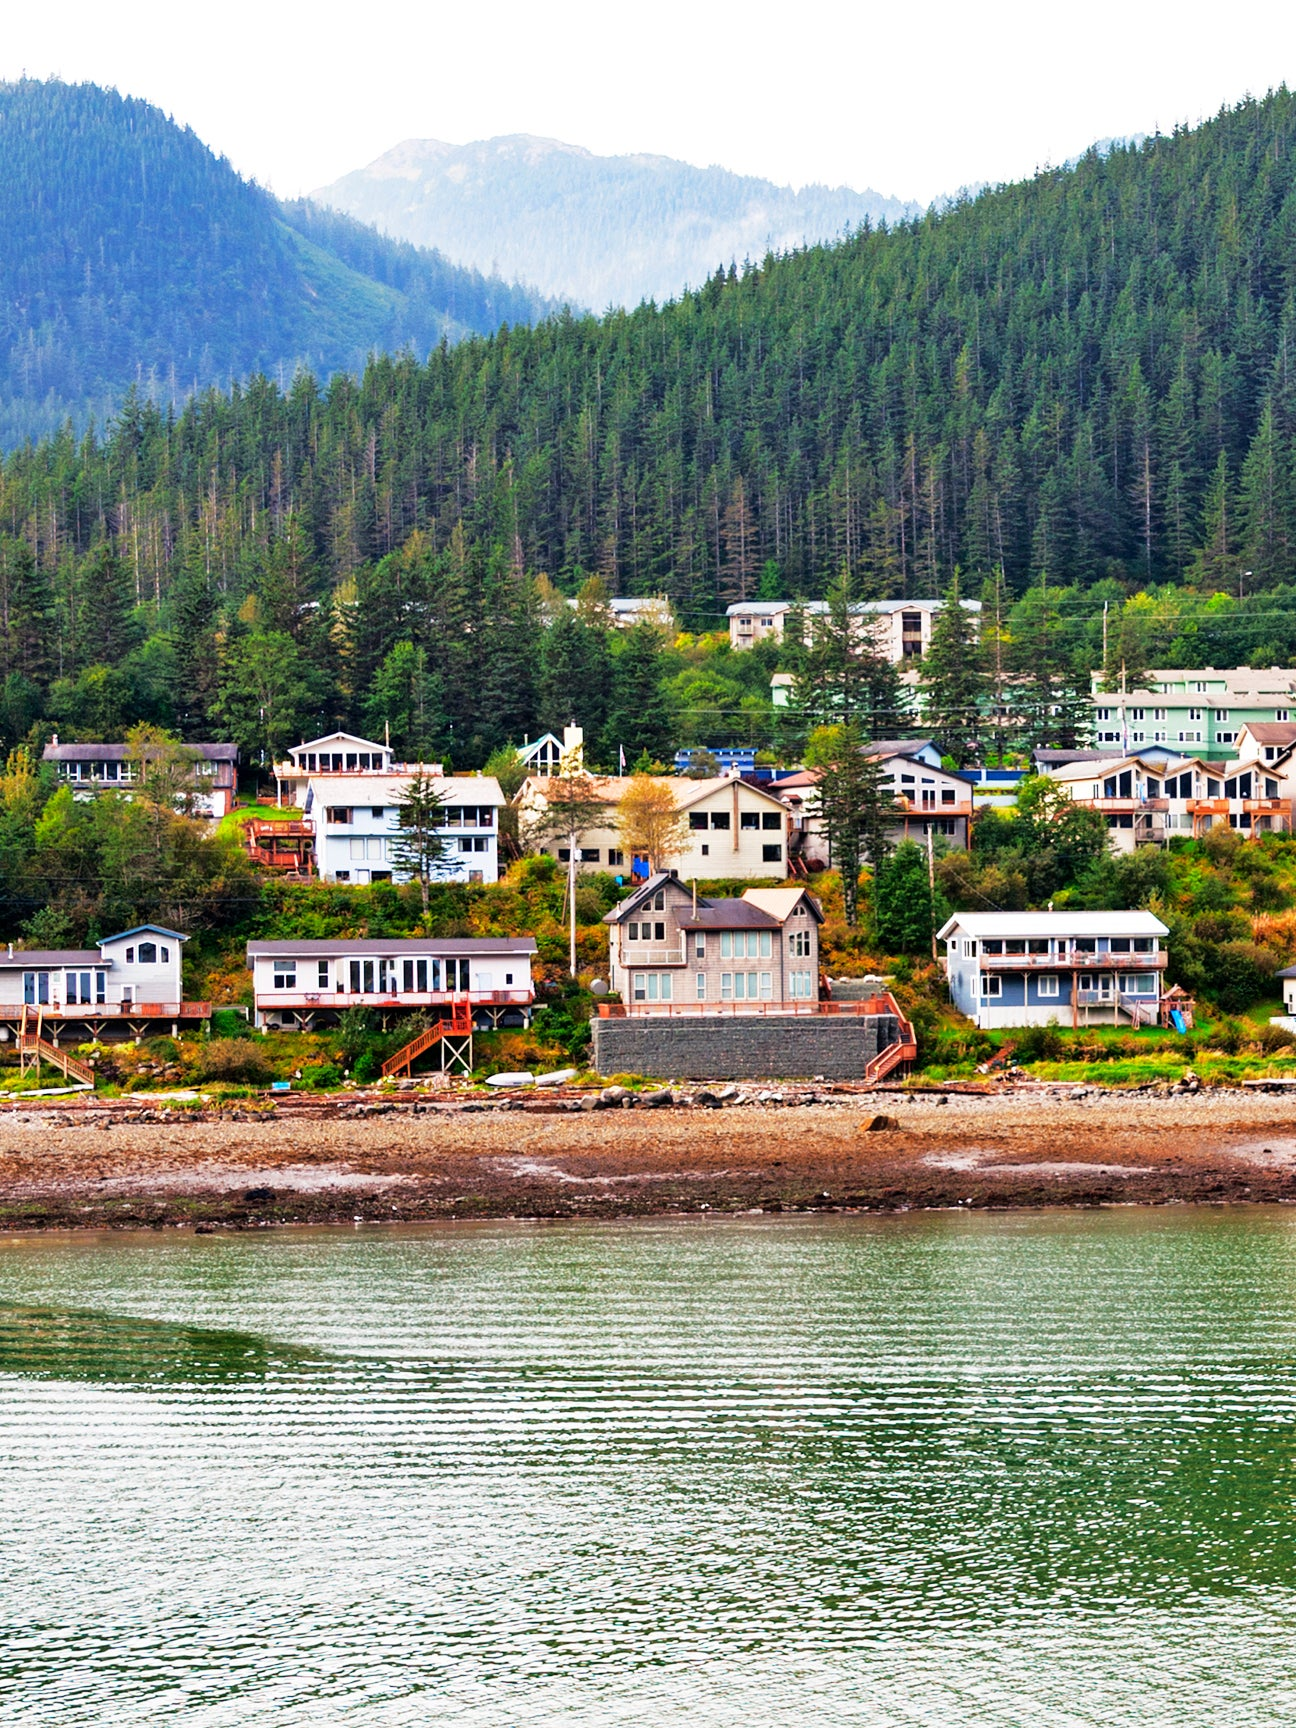 photo of junea alaska by a lake and mountains